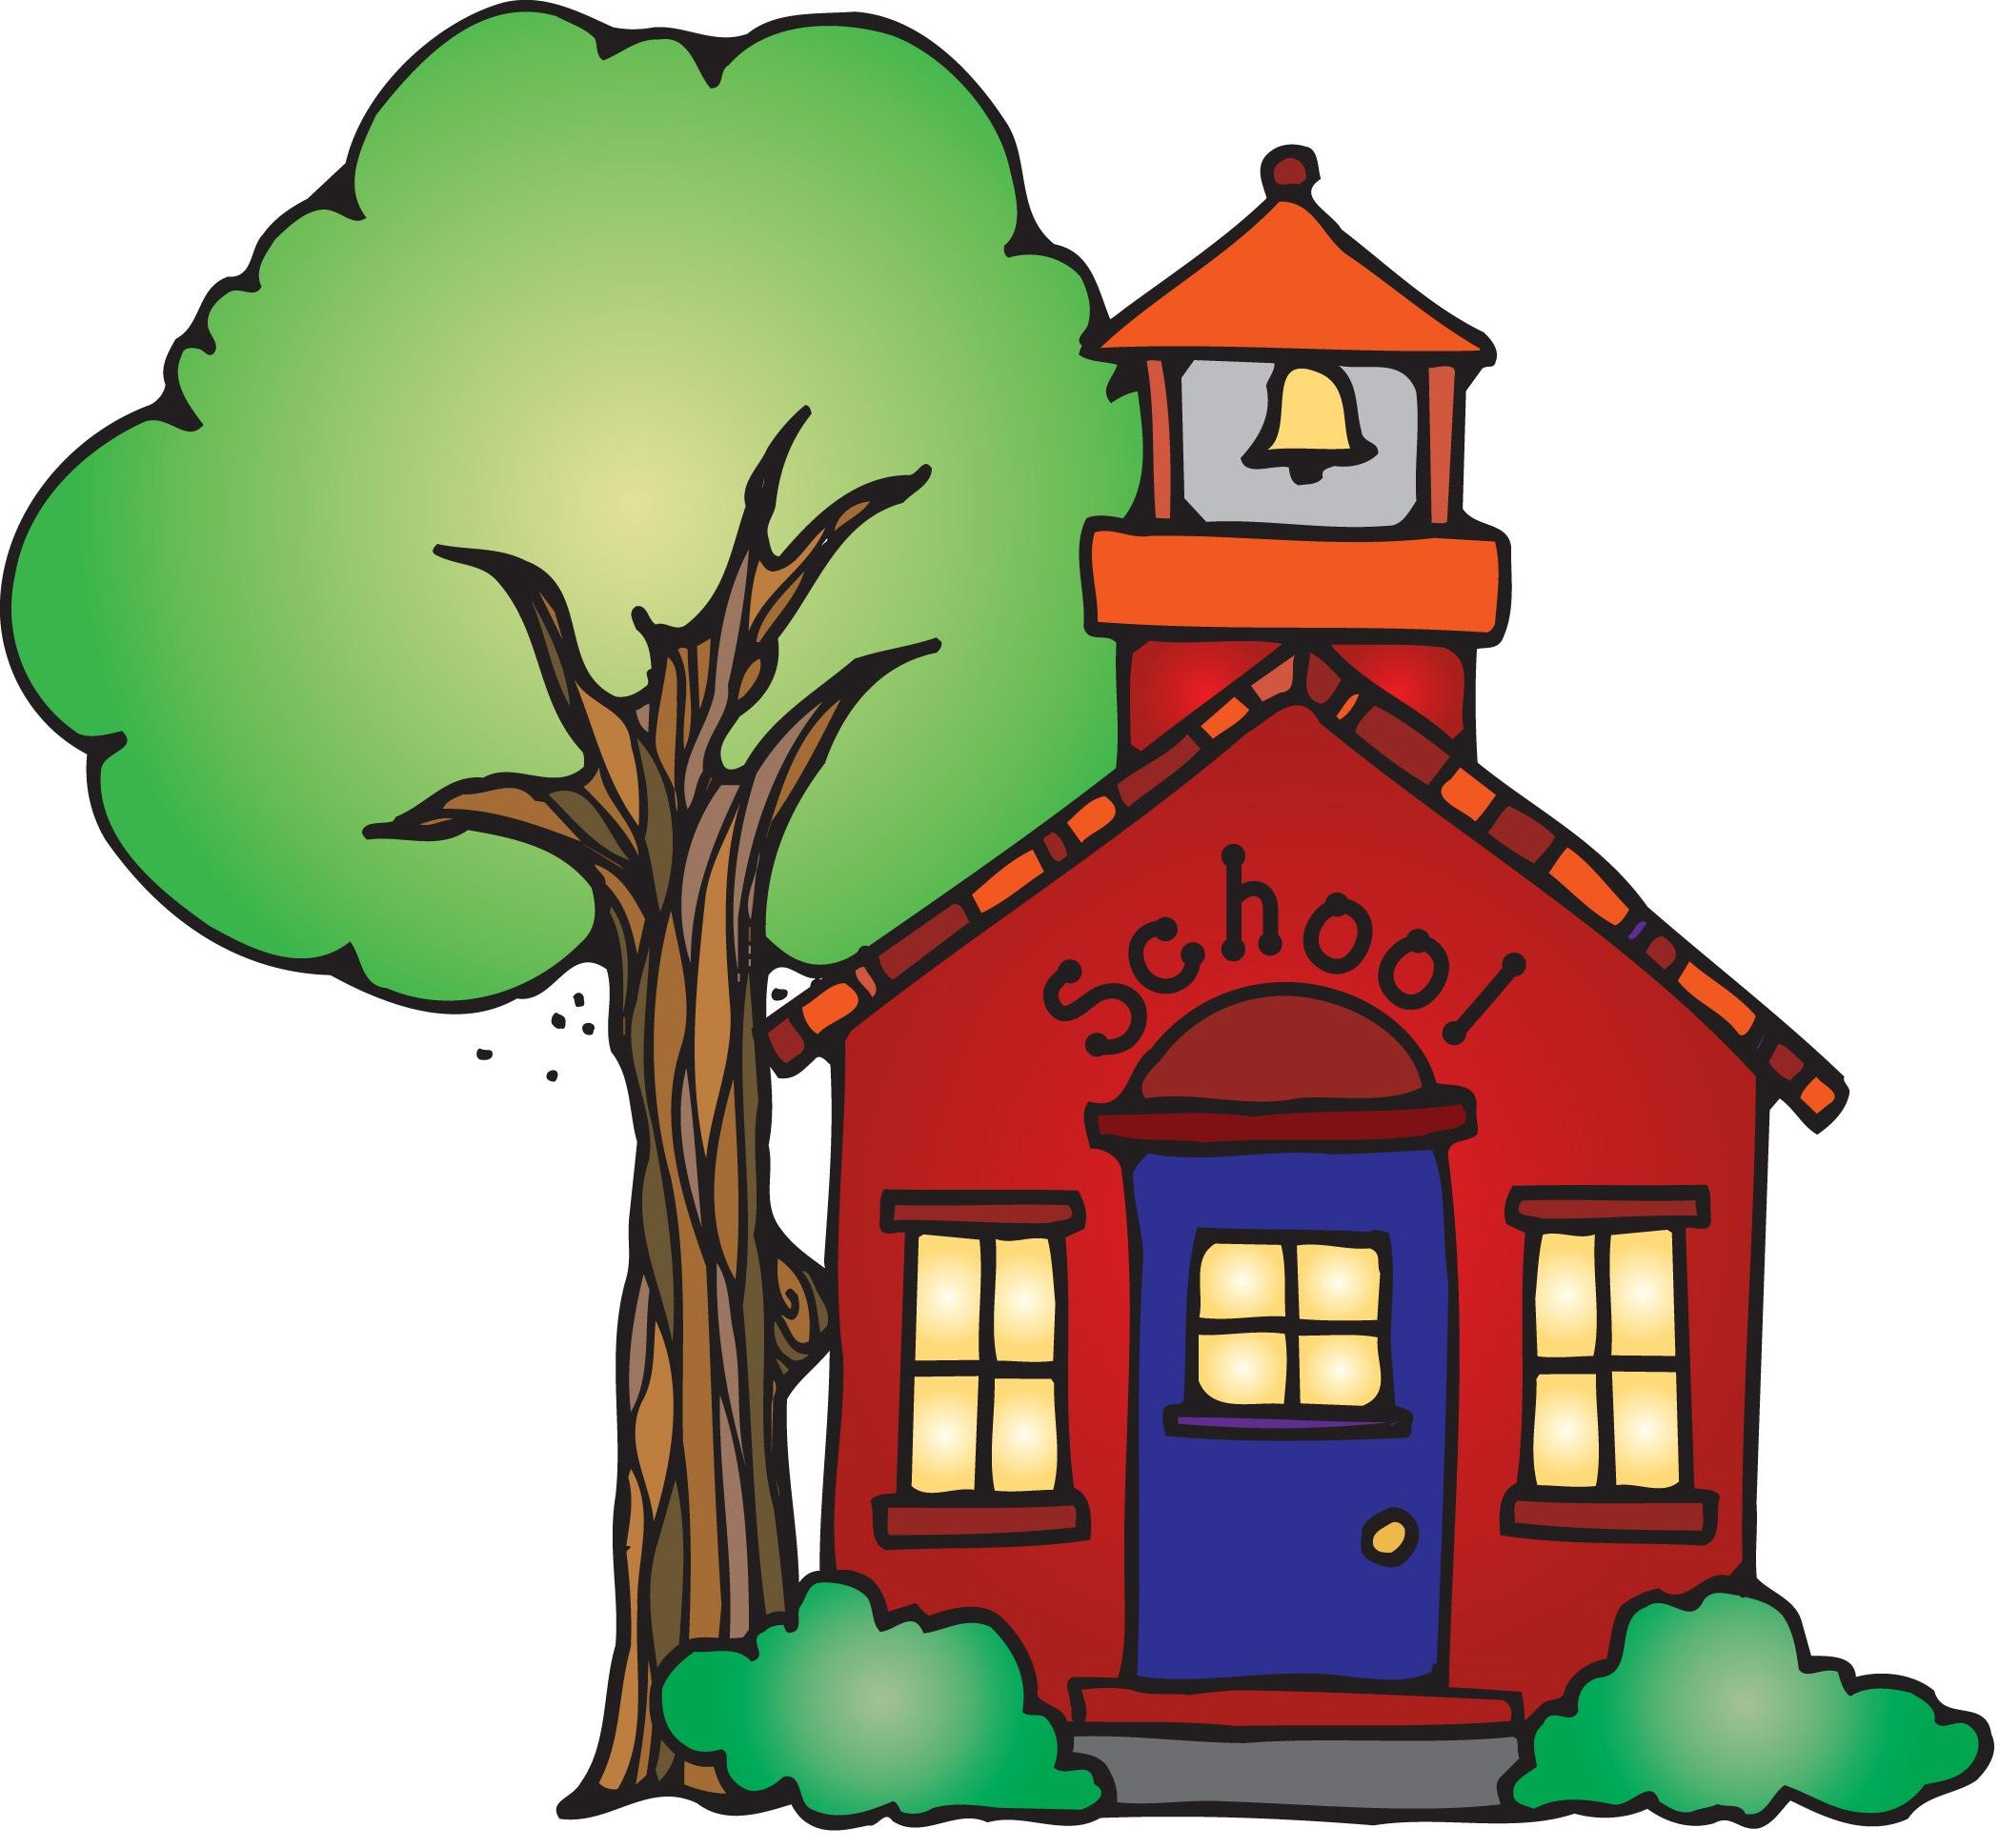 Homes near schools